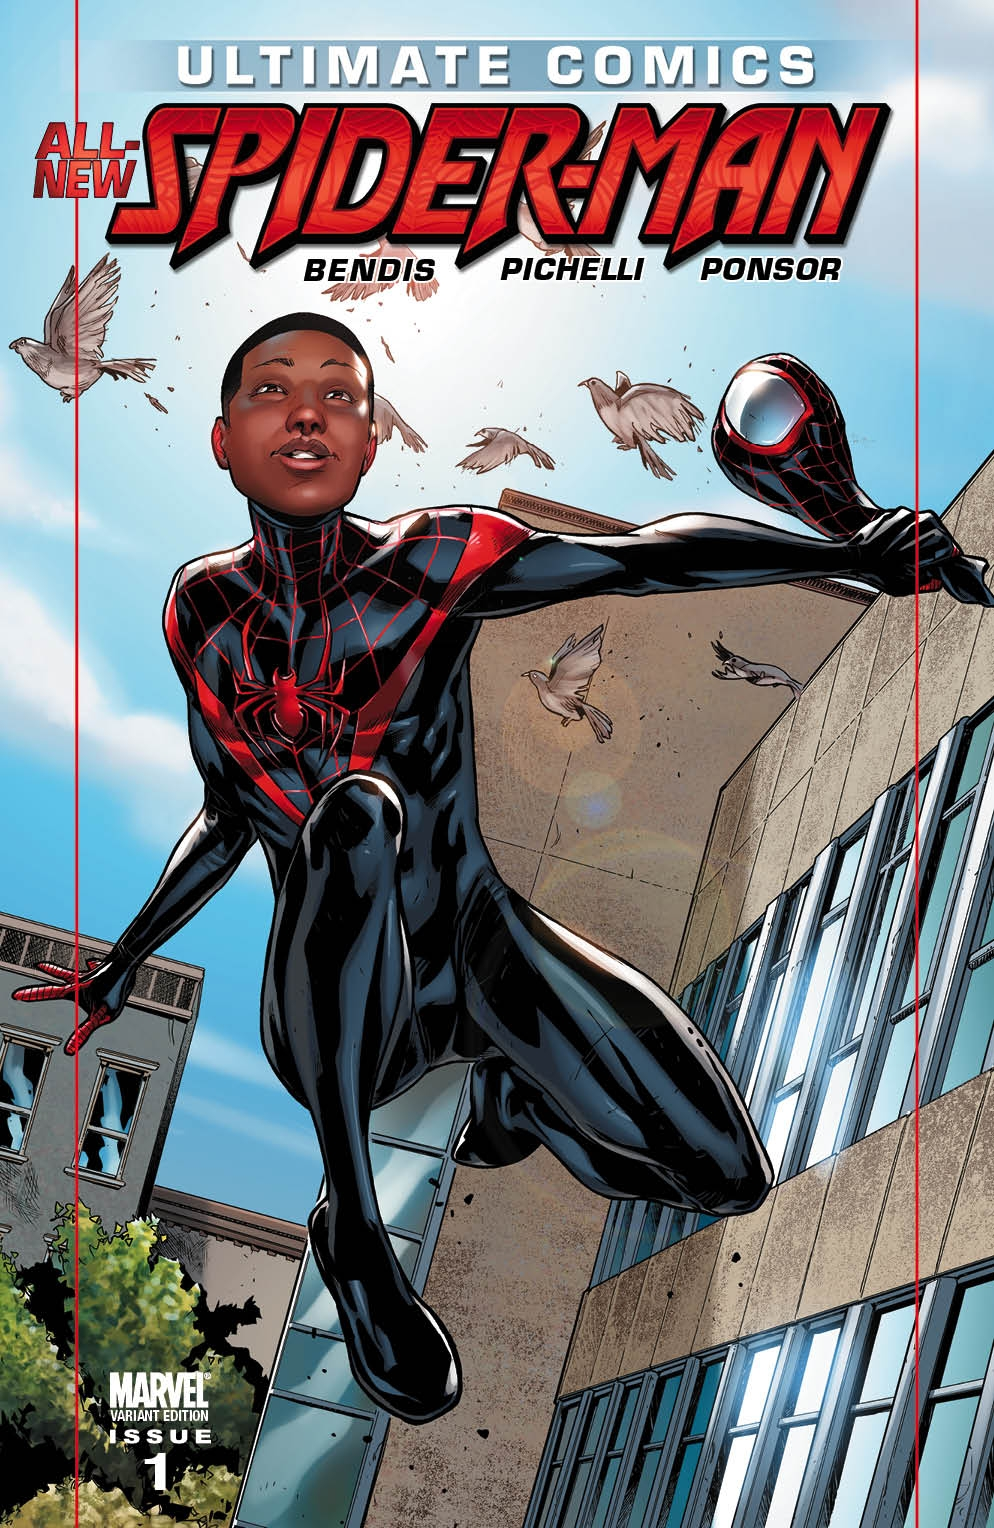 Black Spiderman Comic Another directi...